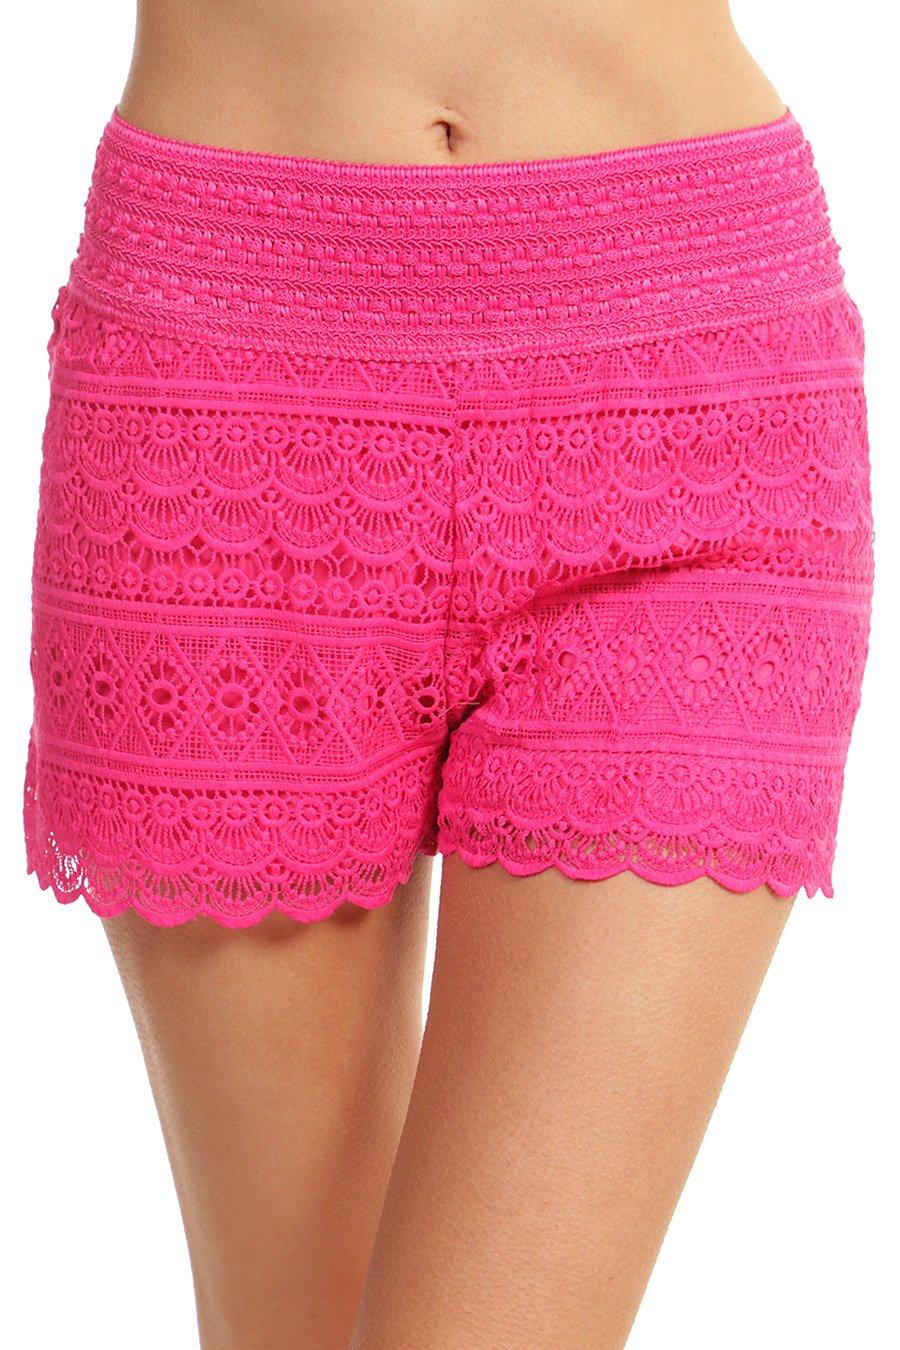 ToBeInStyle Women's Scalloped Lace Shorts - Fuchsia - Small